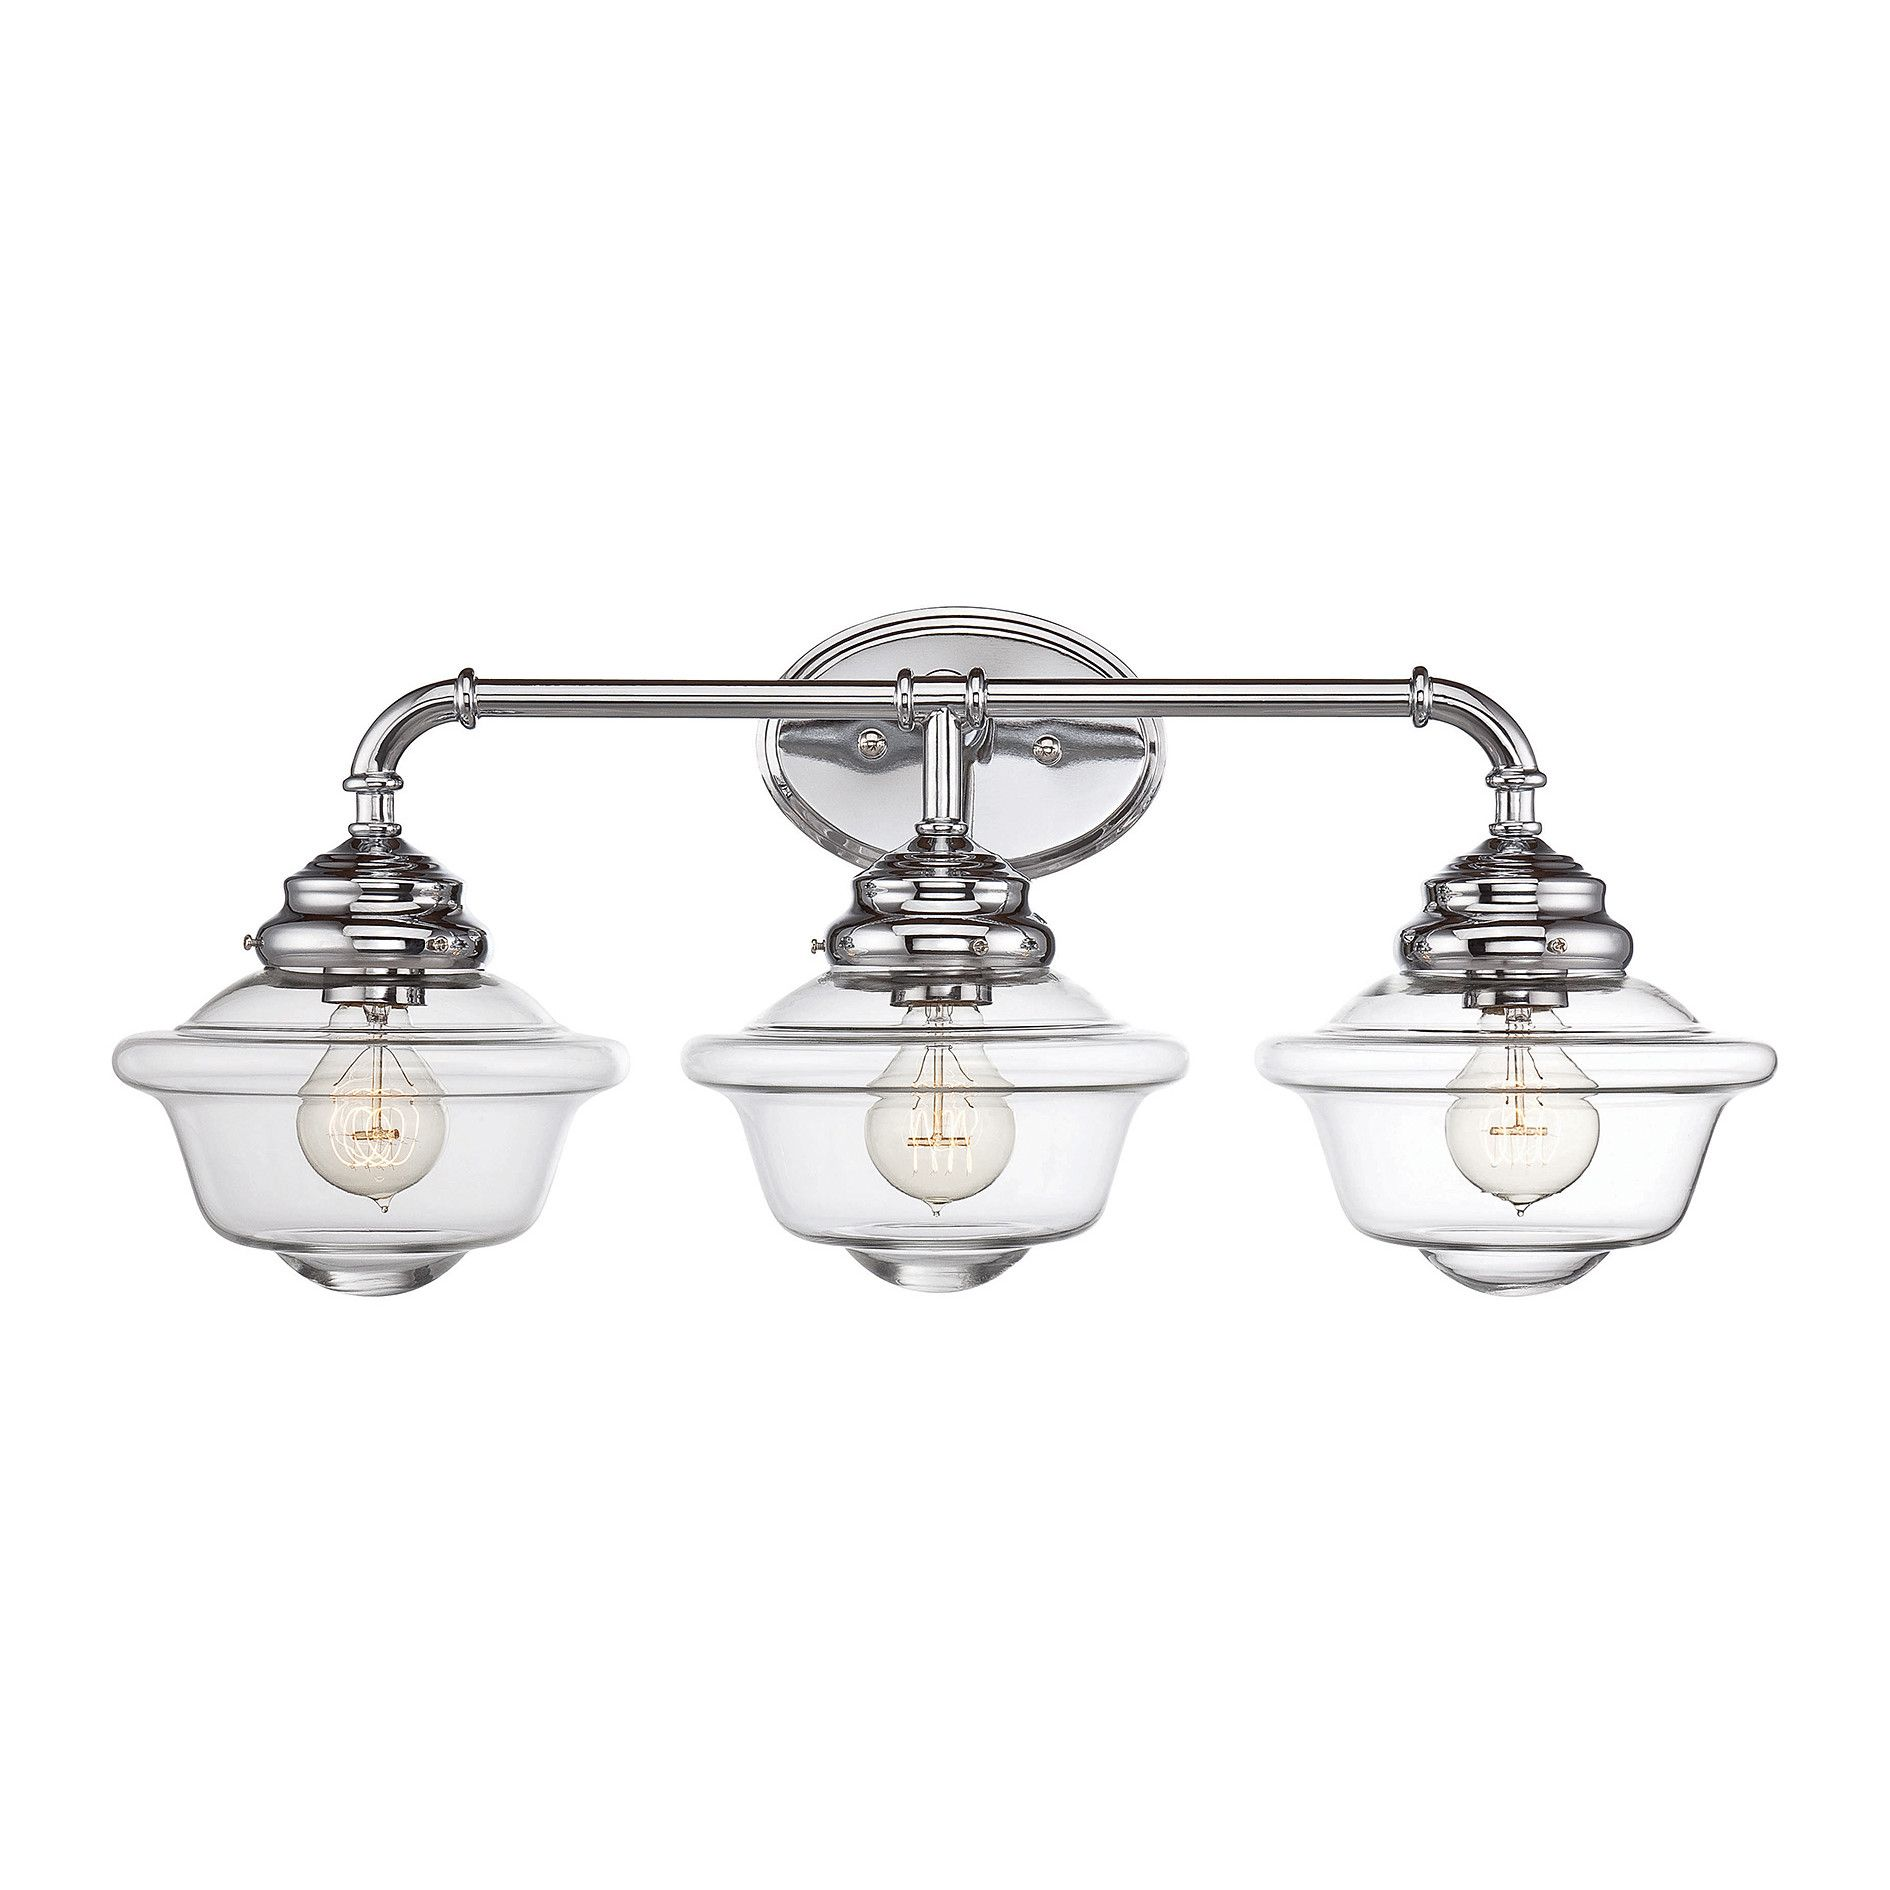 ie chrome light satin with glass framed mare en lights bathroom lighting